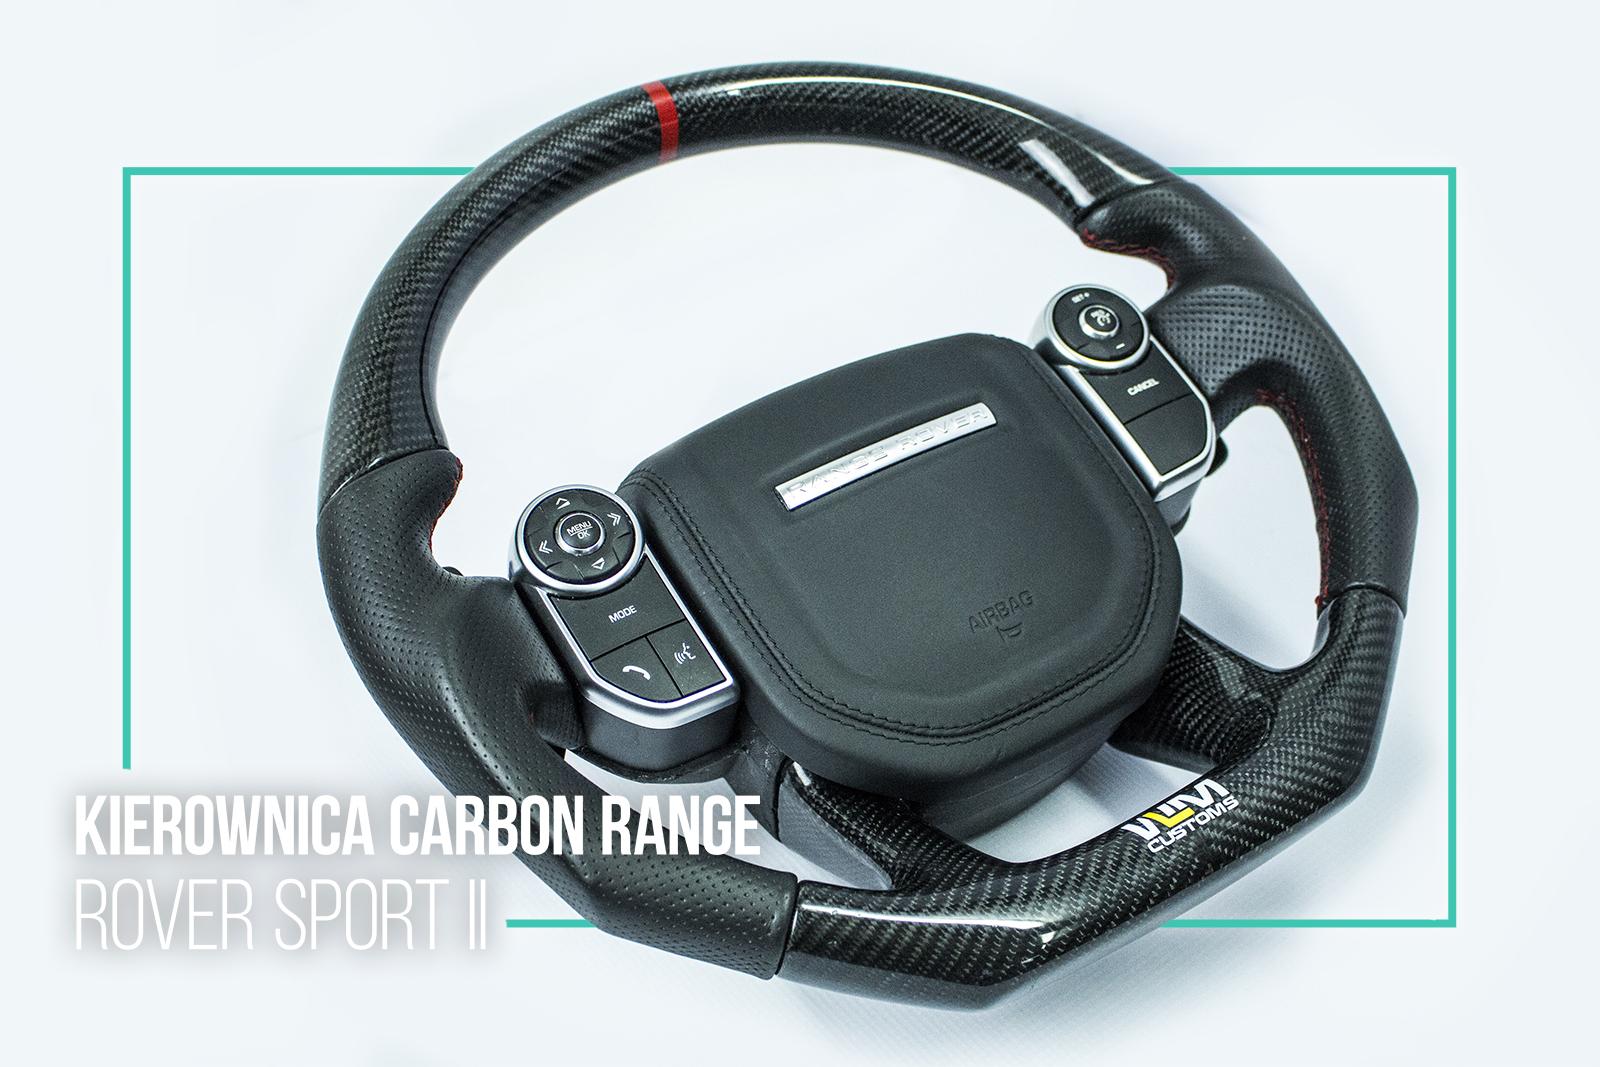 Kierownica Carbon Range Rover Sport II